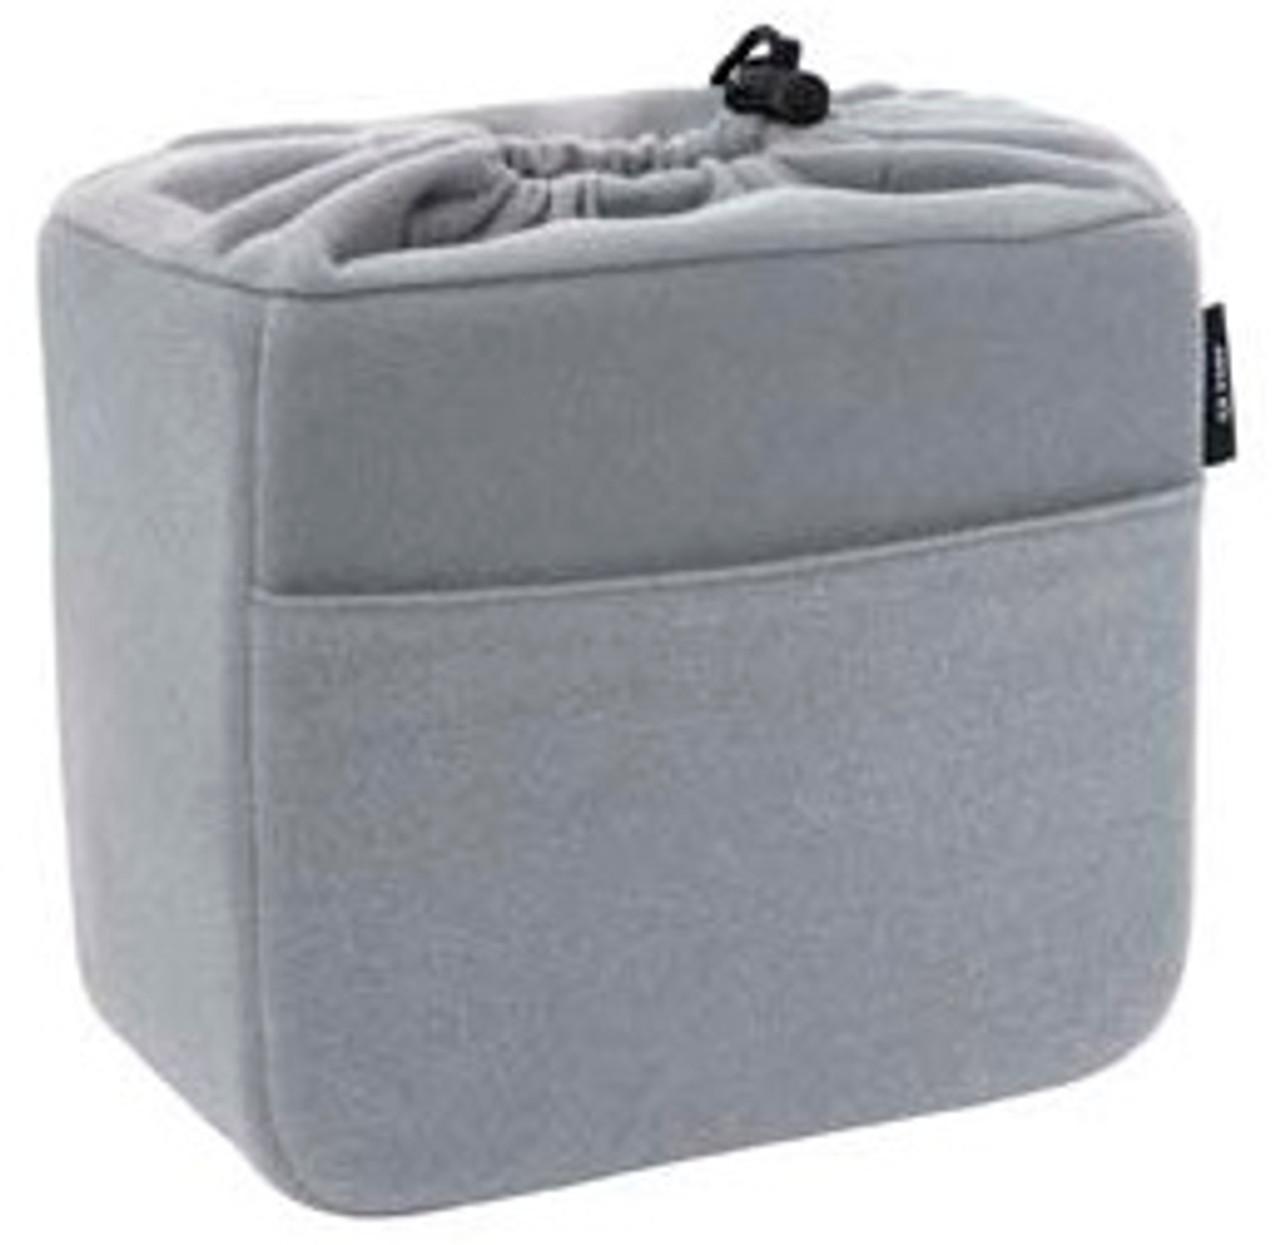 ProMaster Bag Insert - Extra Small